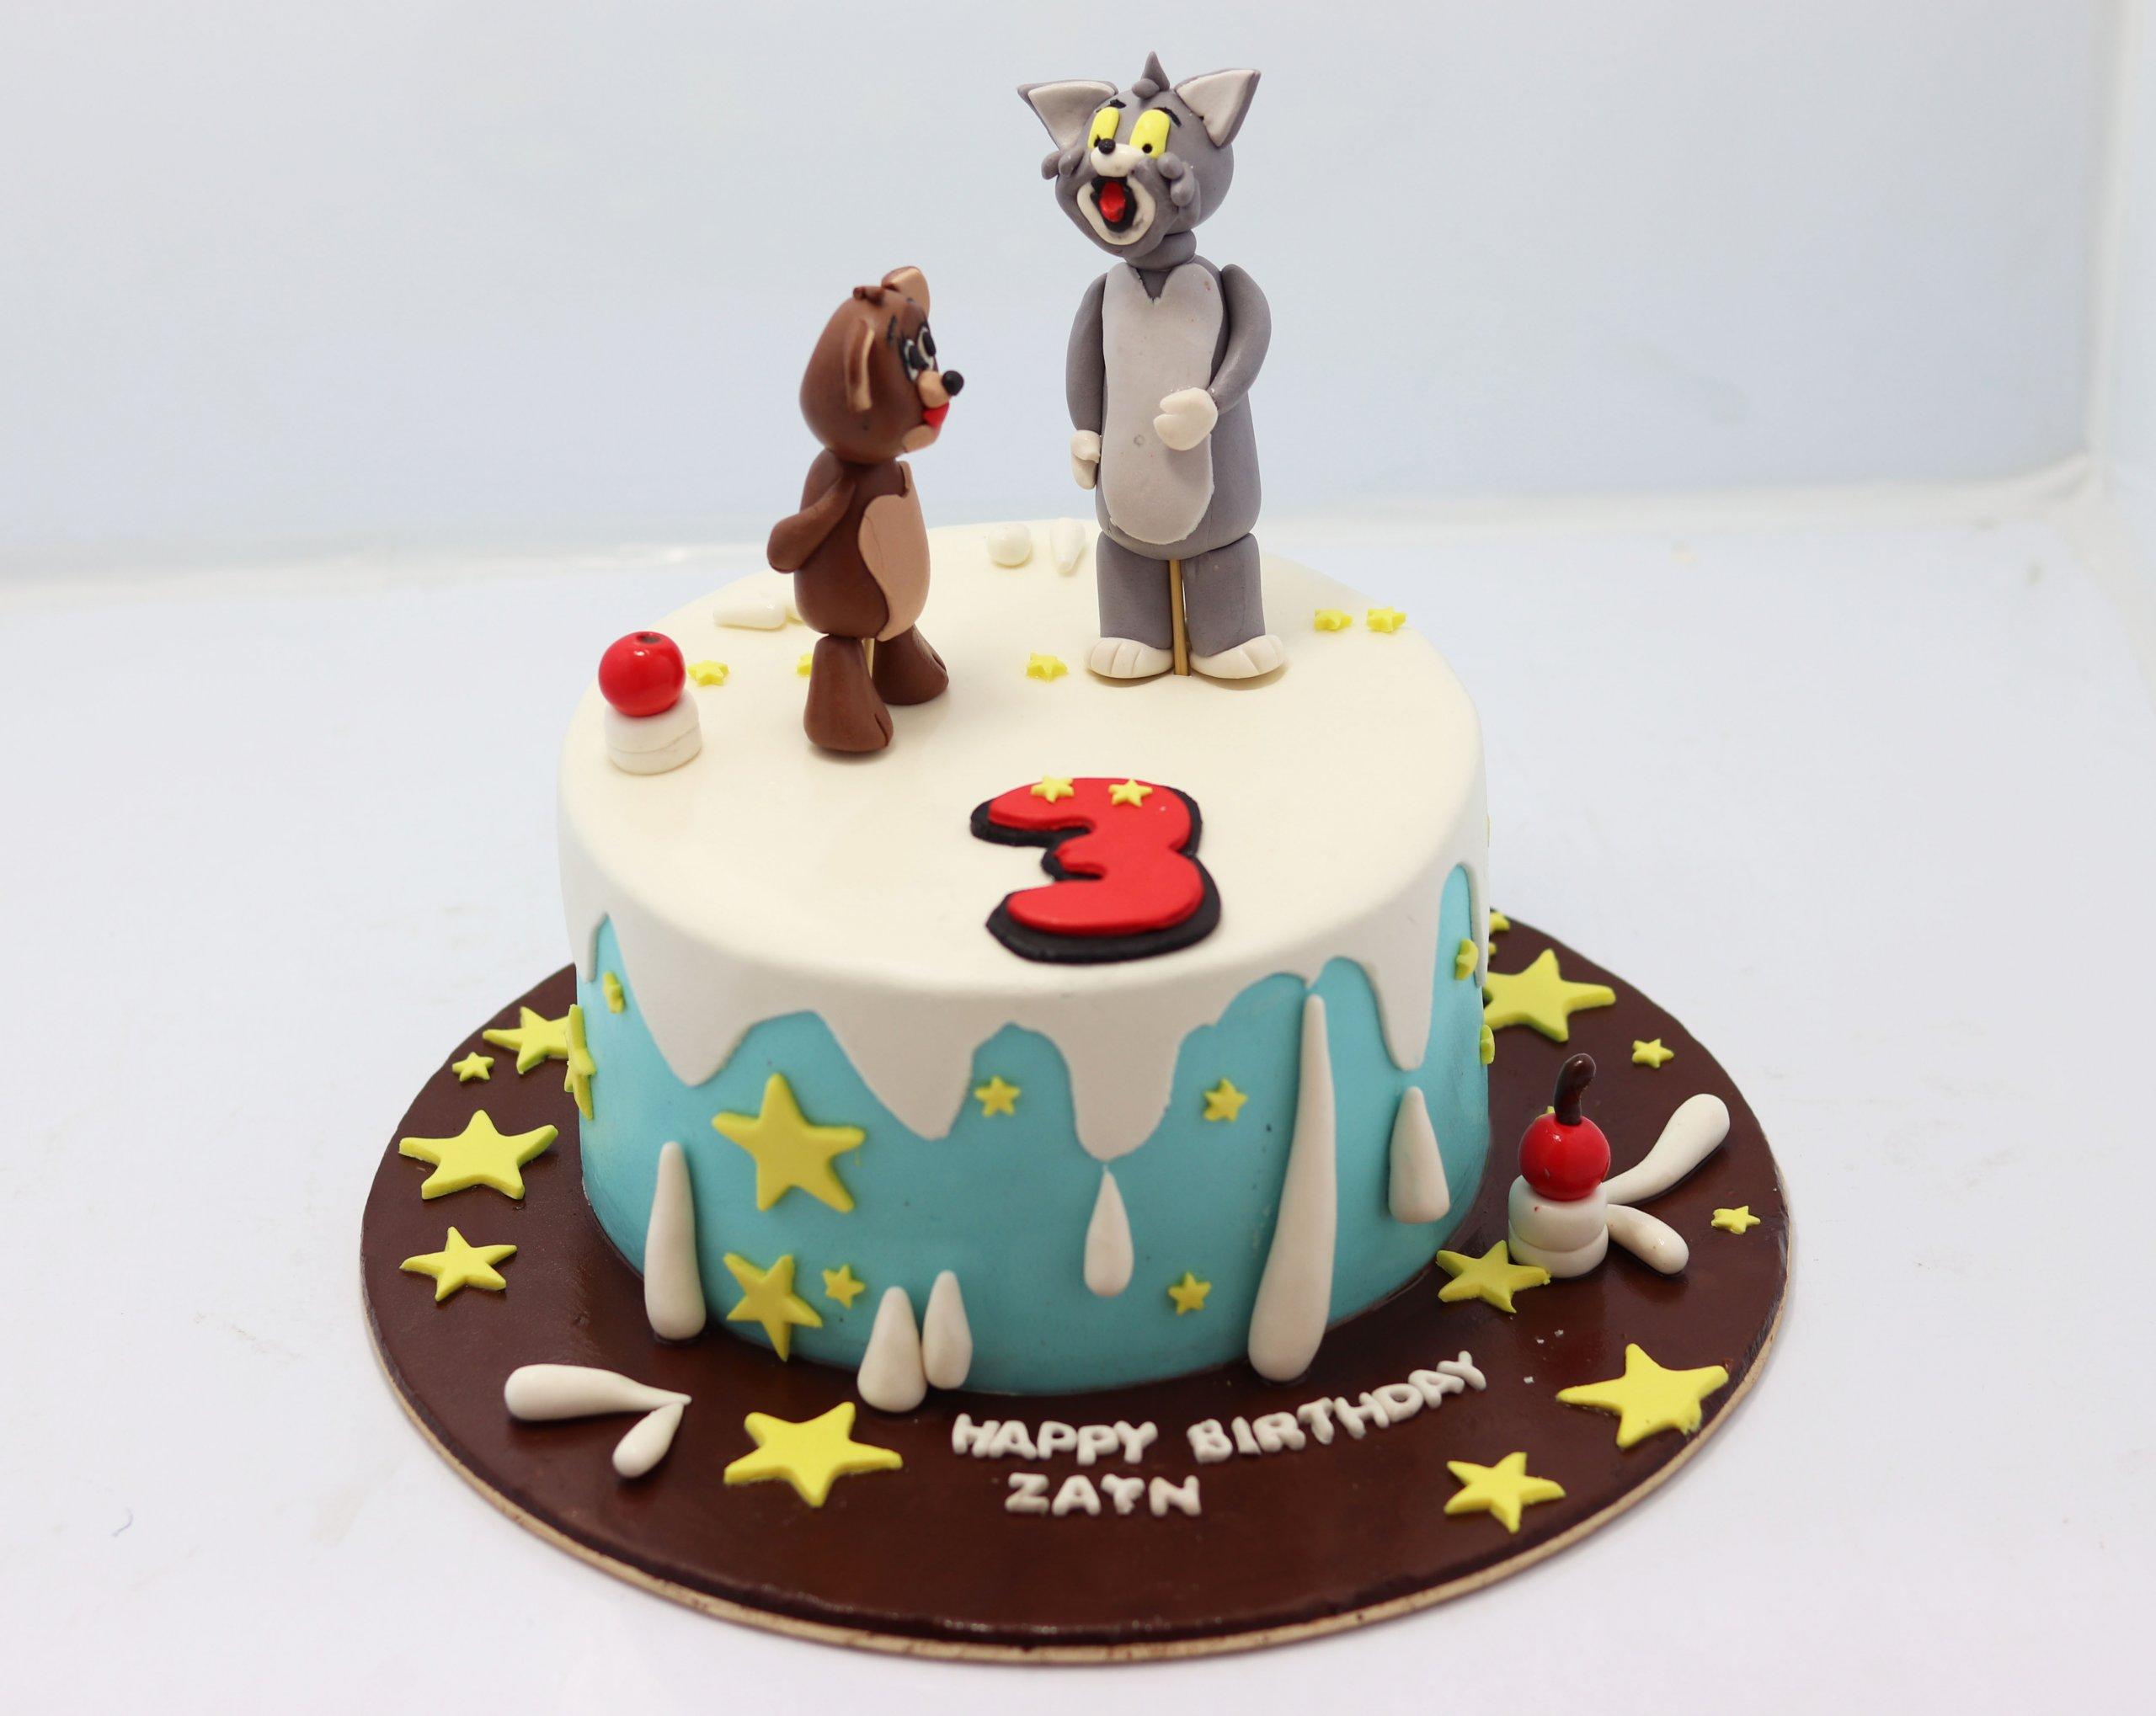 Pleasant Tom And Jerry Theme Birthday Cake Tom And Jerry Cake Near Me Funny Birthday Cards Online Alyptdamsfinfo